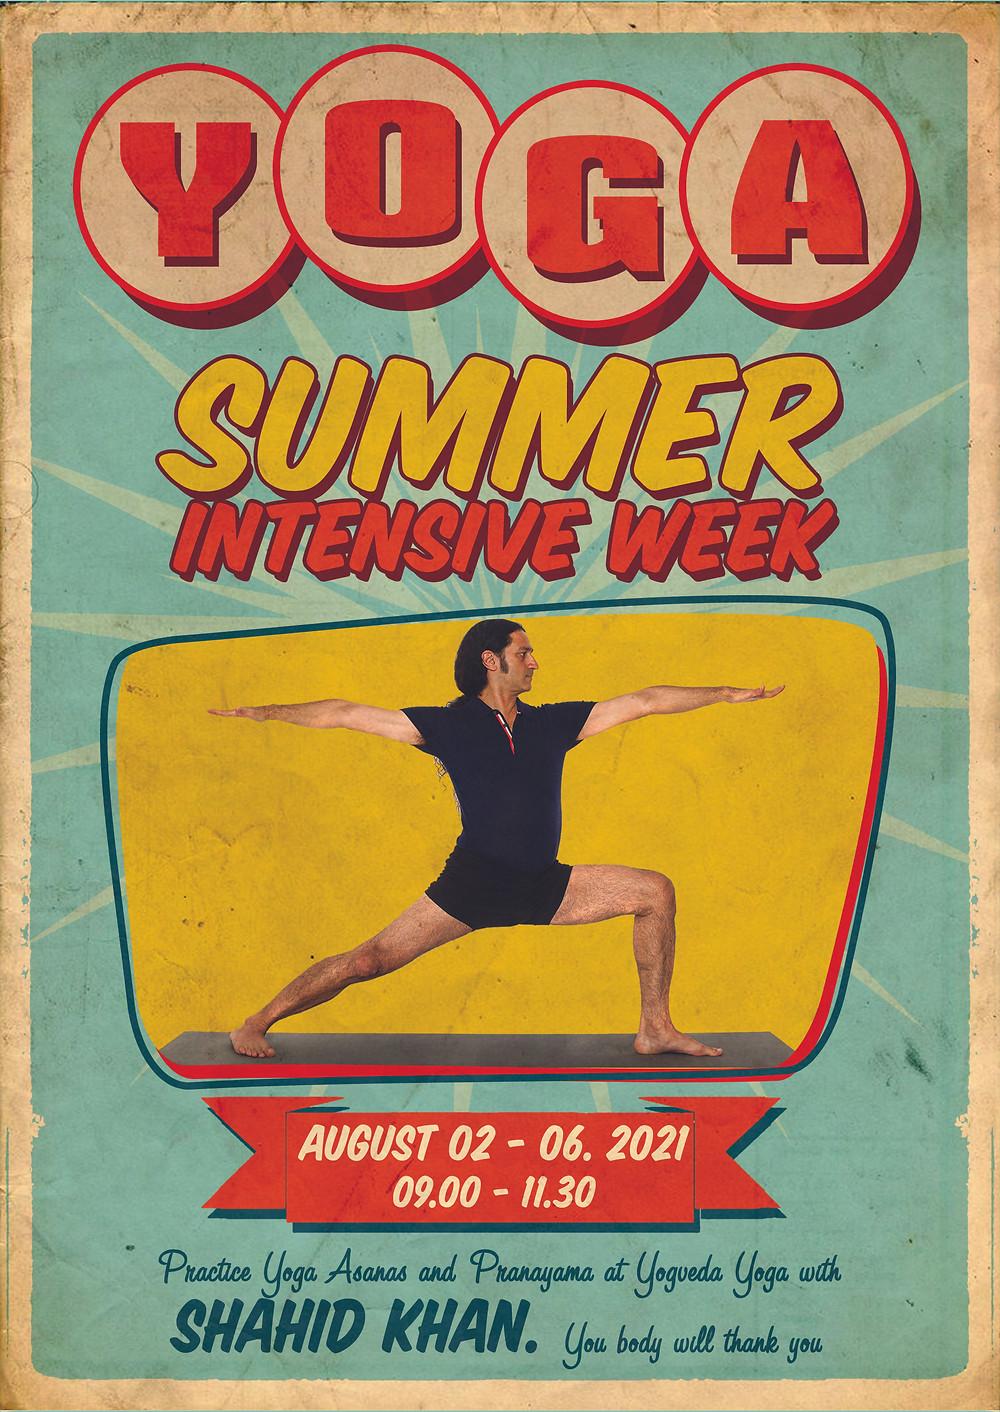 Summer workshop at Yogveda Yoga